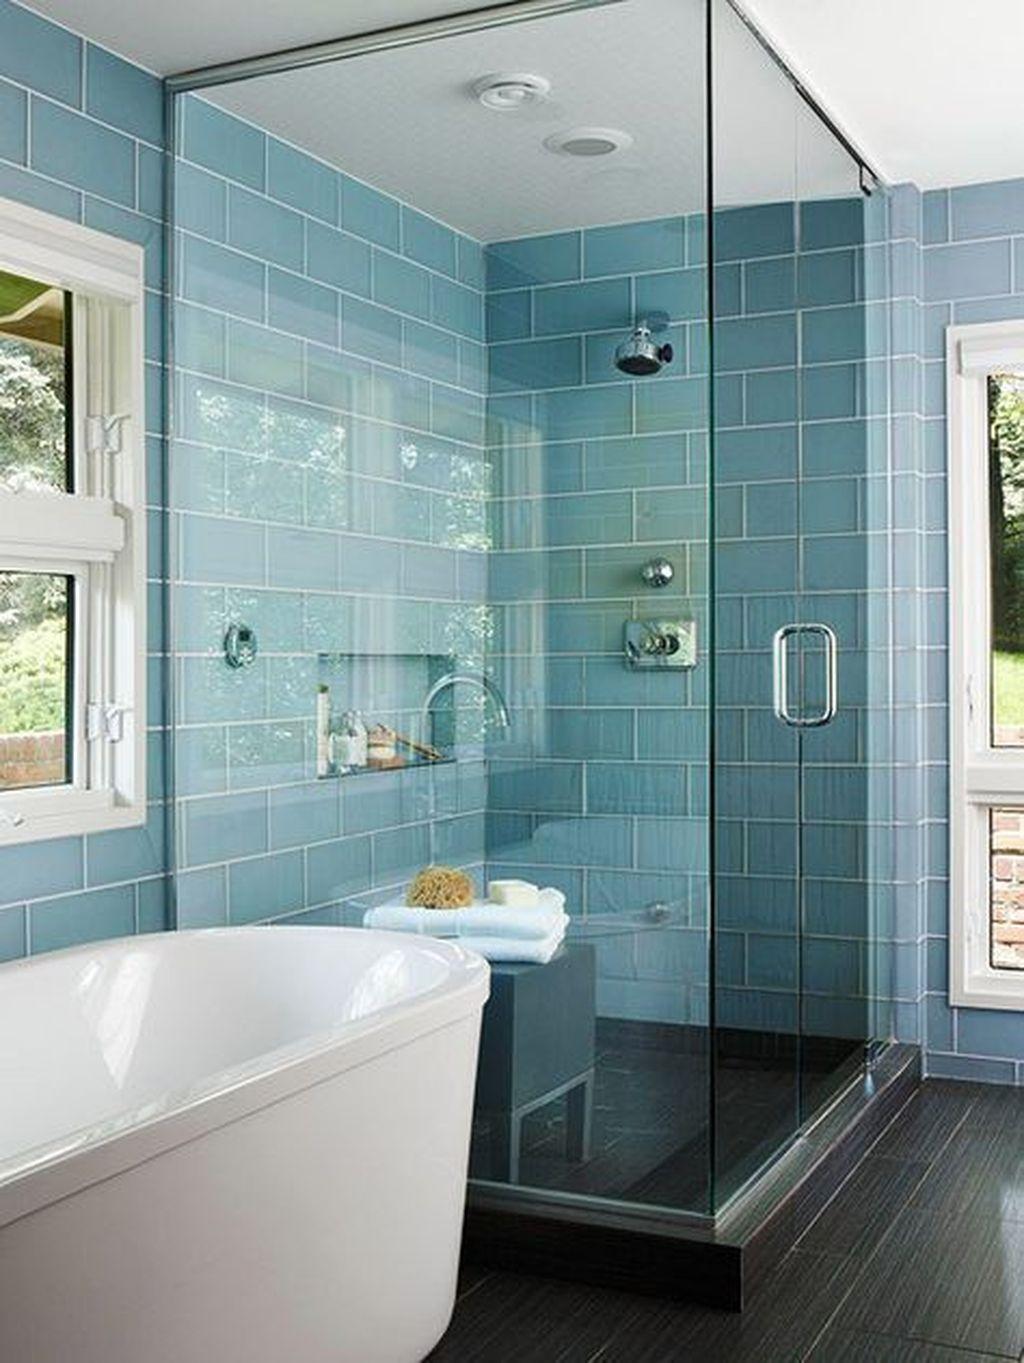 Lovely Bathroom Ceramic Tile Ideas You Should Copy 24